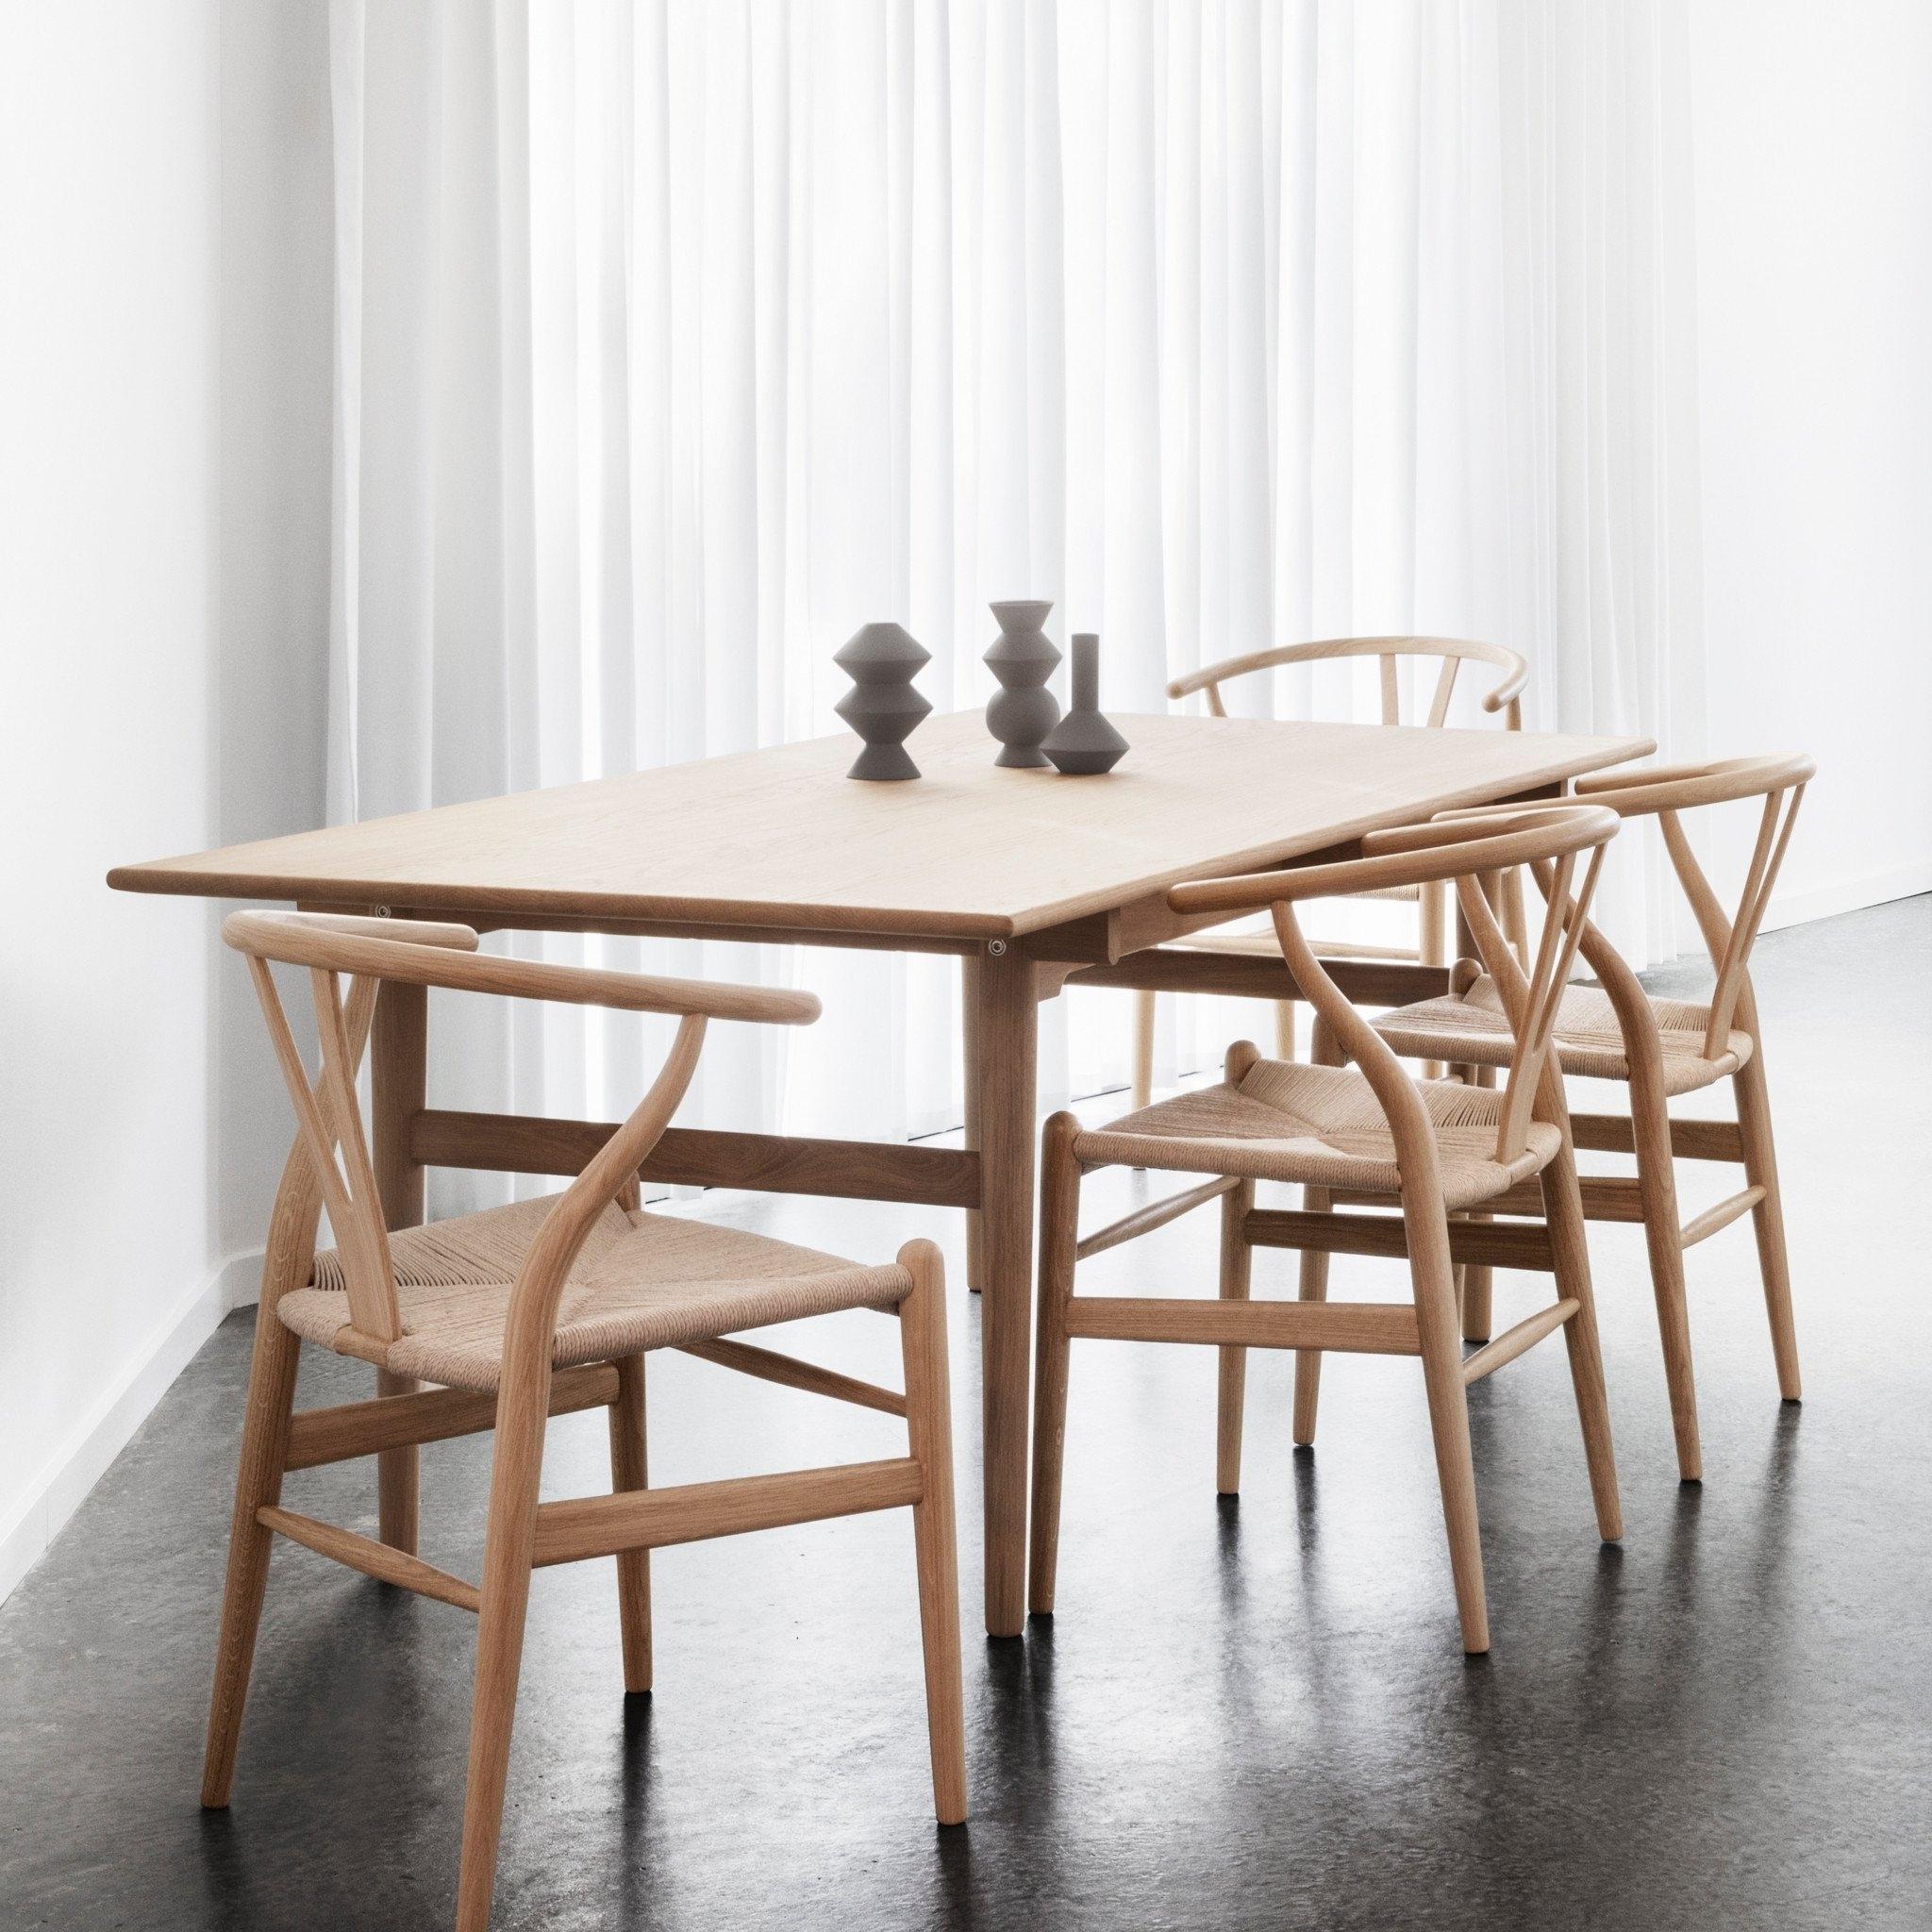 Newest Ch327 Dining Tablecarl Hansen & Søn — Haus® Regarding London Dining Tables (View 11 of 25)